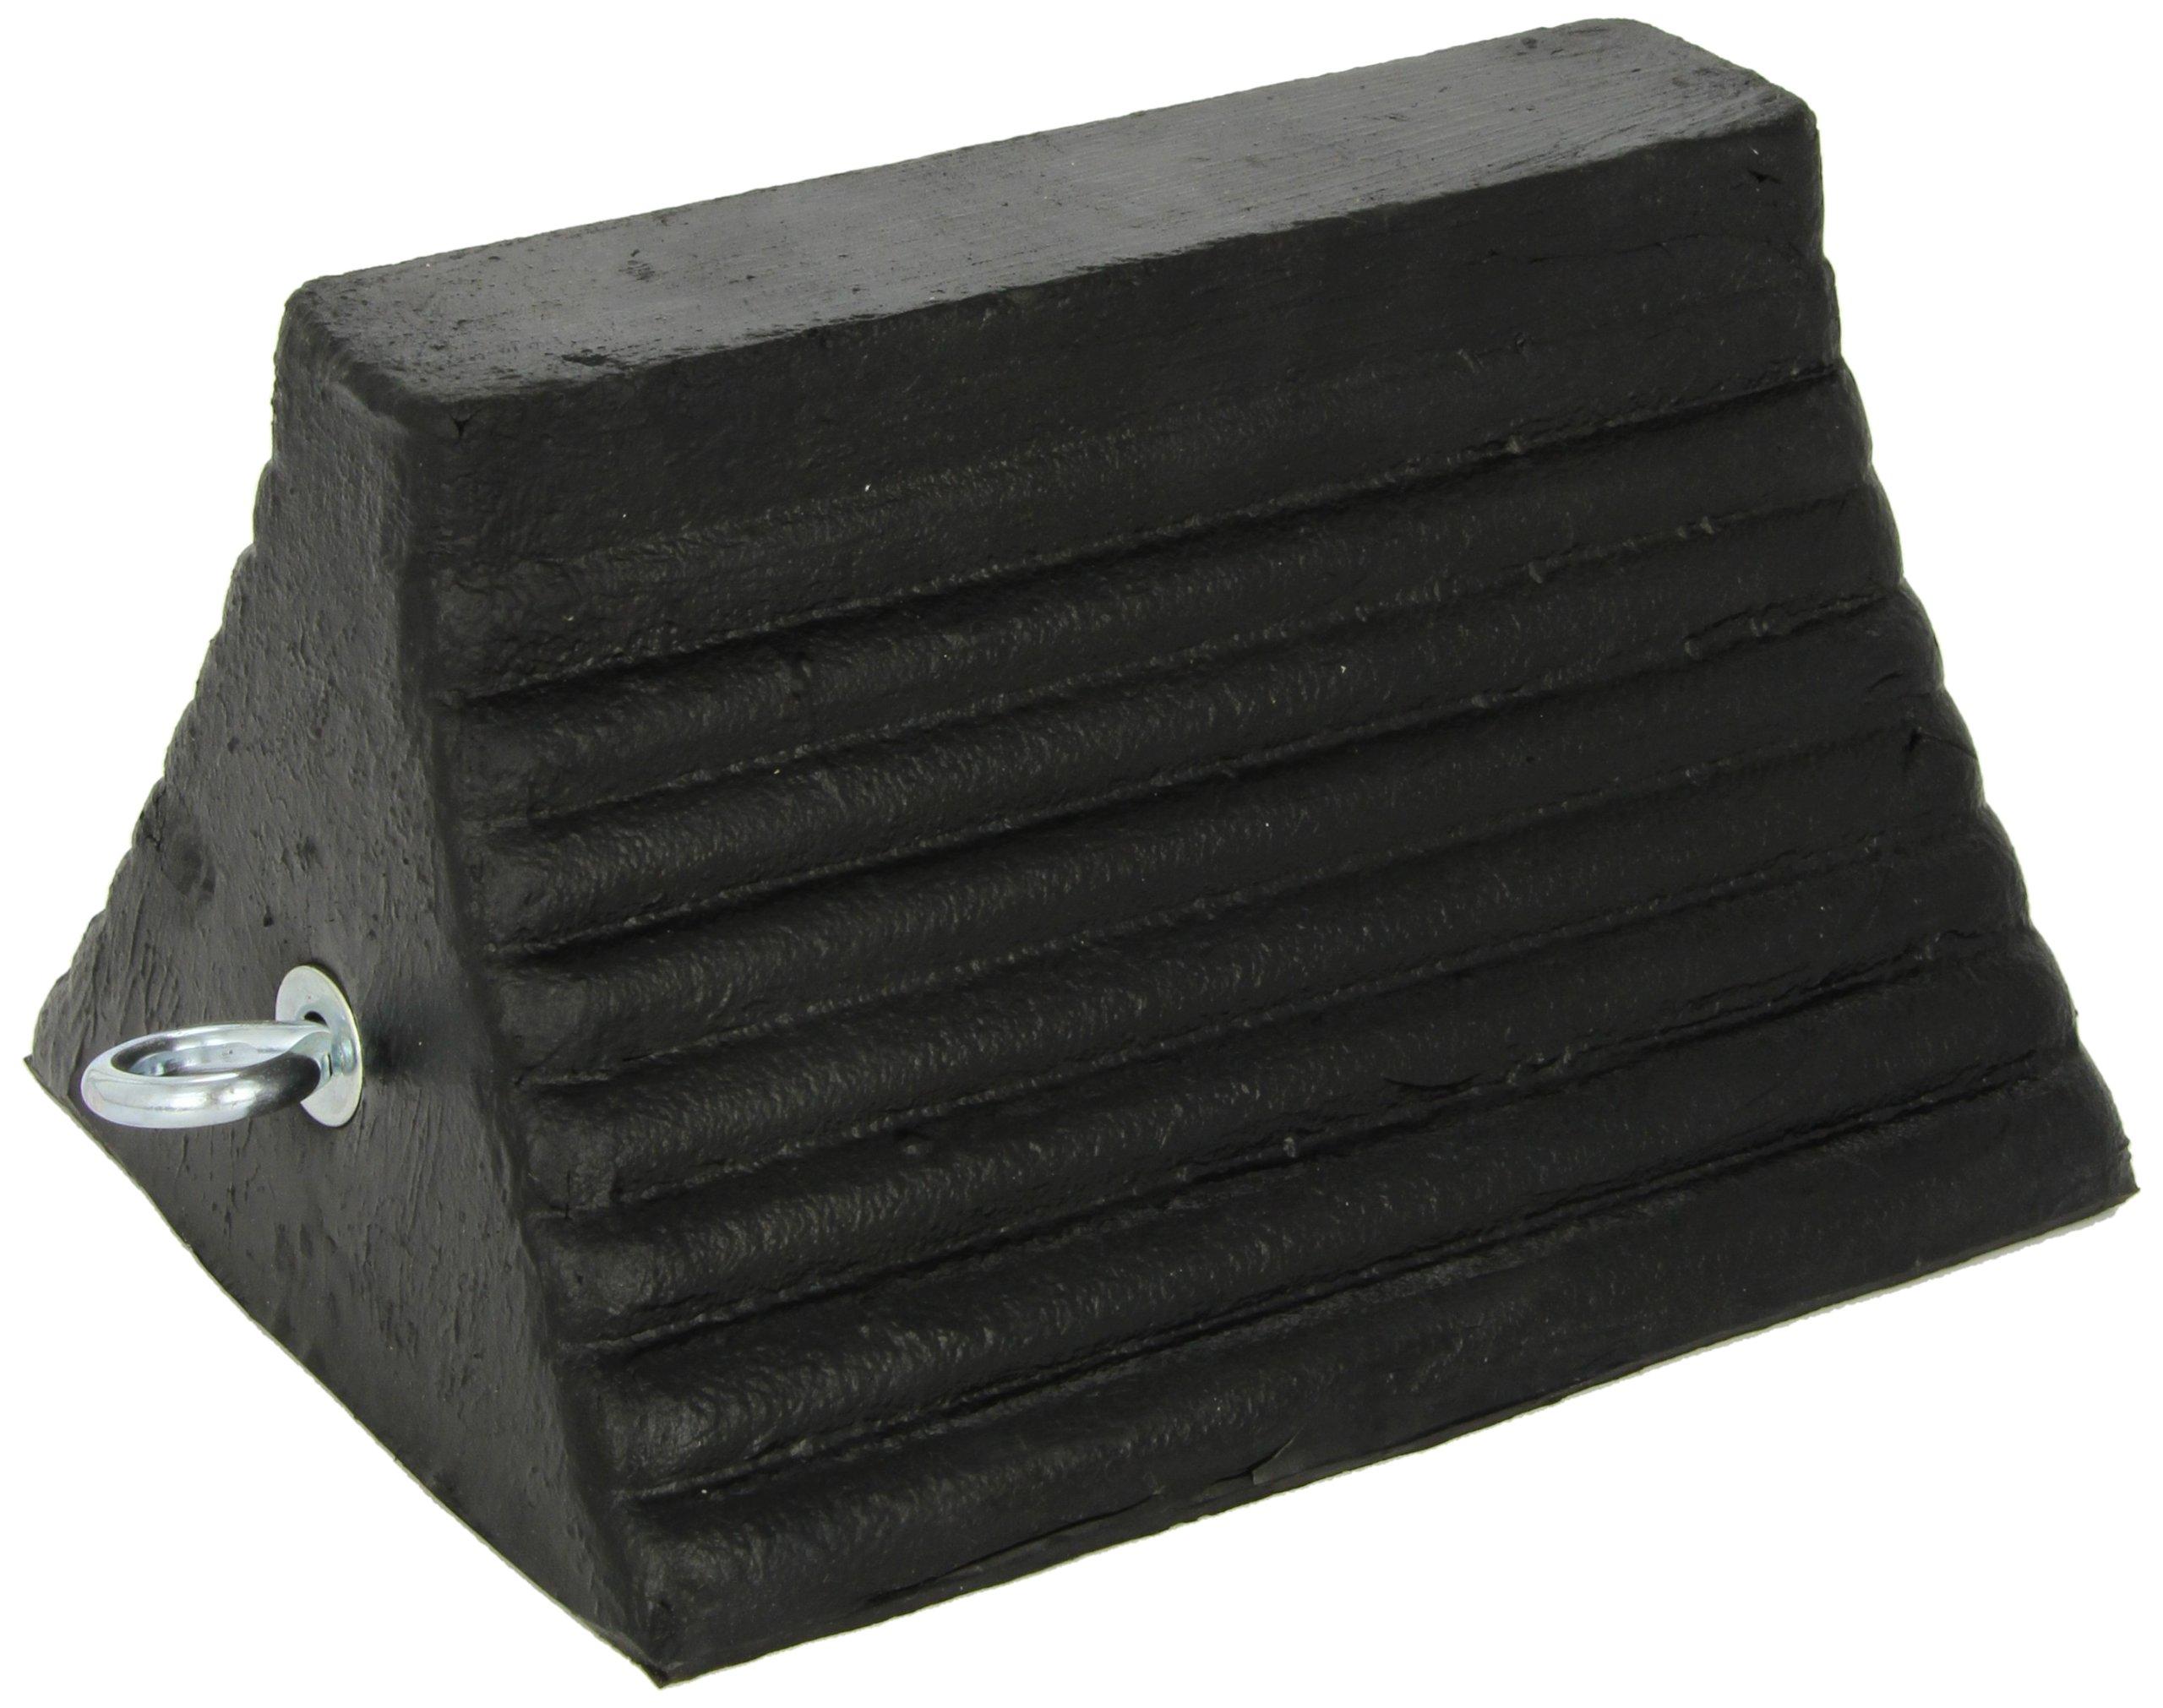 Roadblock RC815 Rubber Wheel Chock with Void Bottom, Black, 10'' Length x 8'' Width x 6'' Height